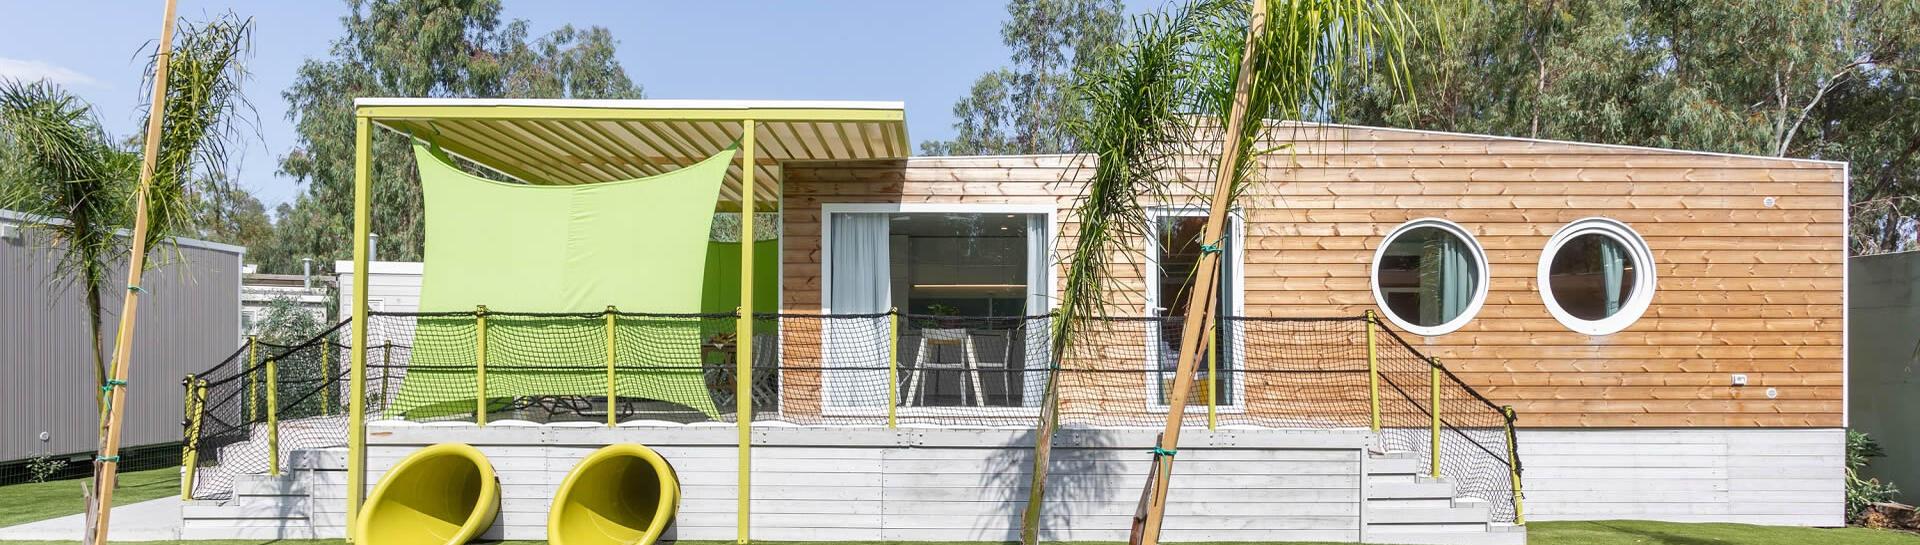 4mori en wonderland-three-room-apartments 011